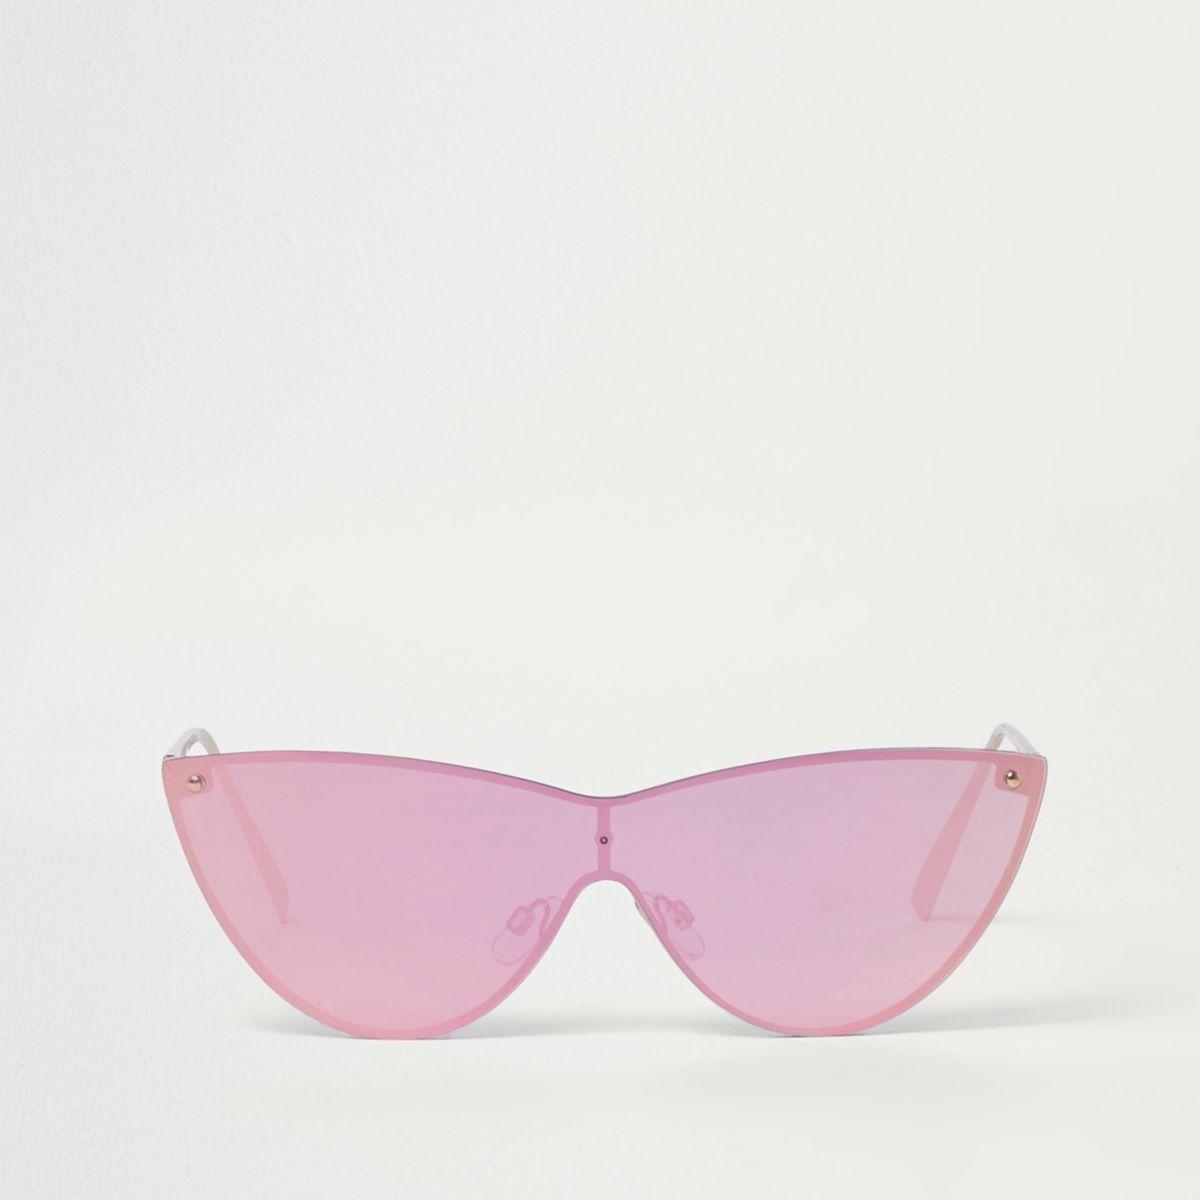 Goudkleurige cat-eye-zonnebril met roze glazen